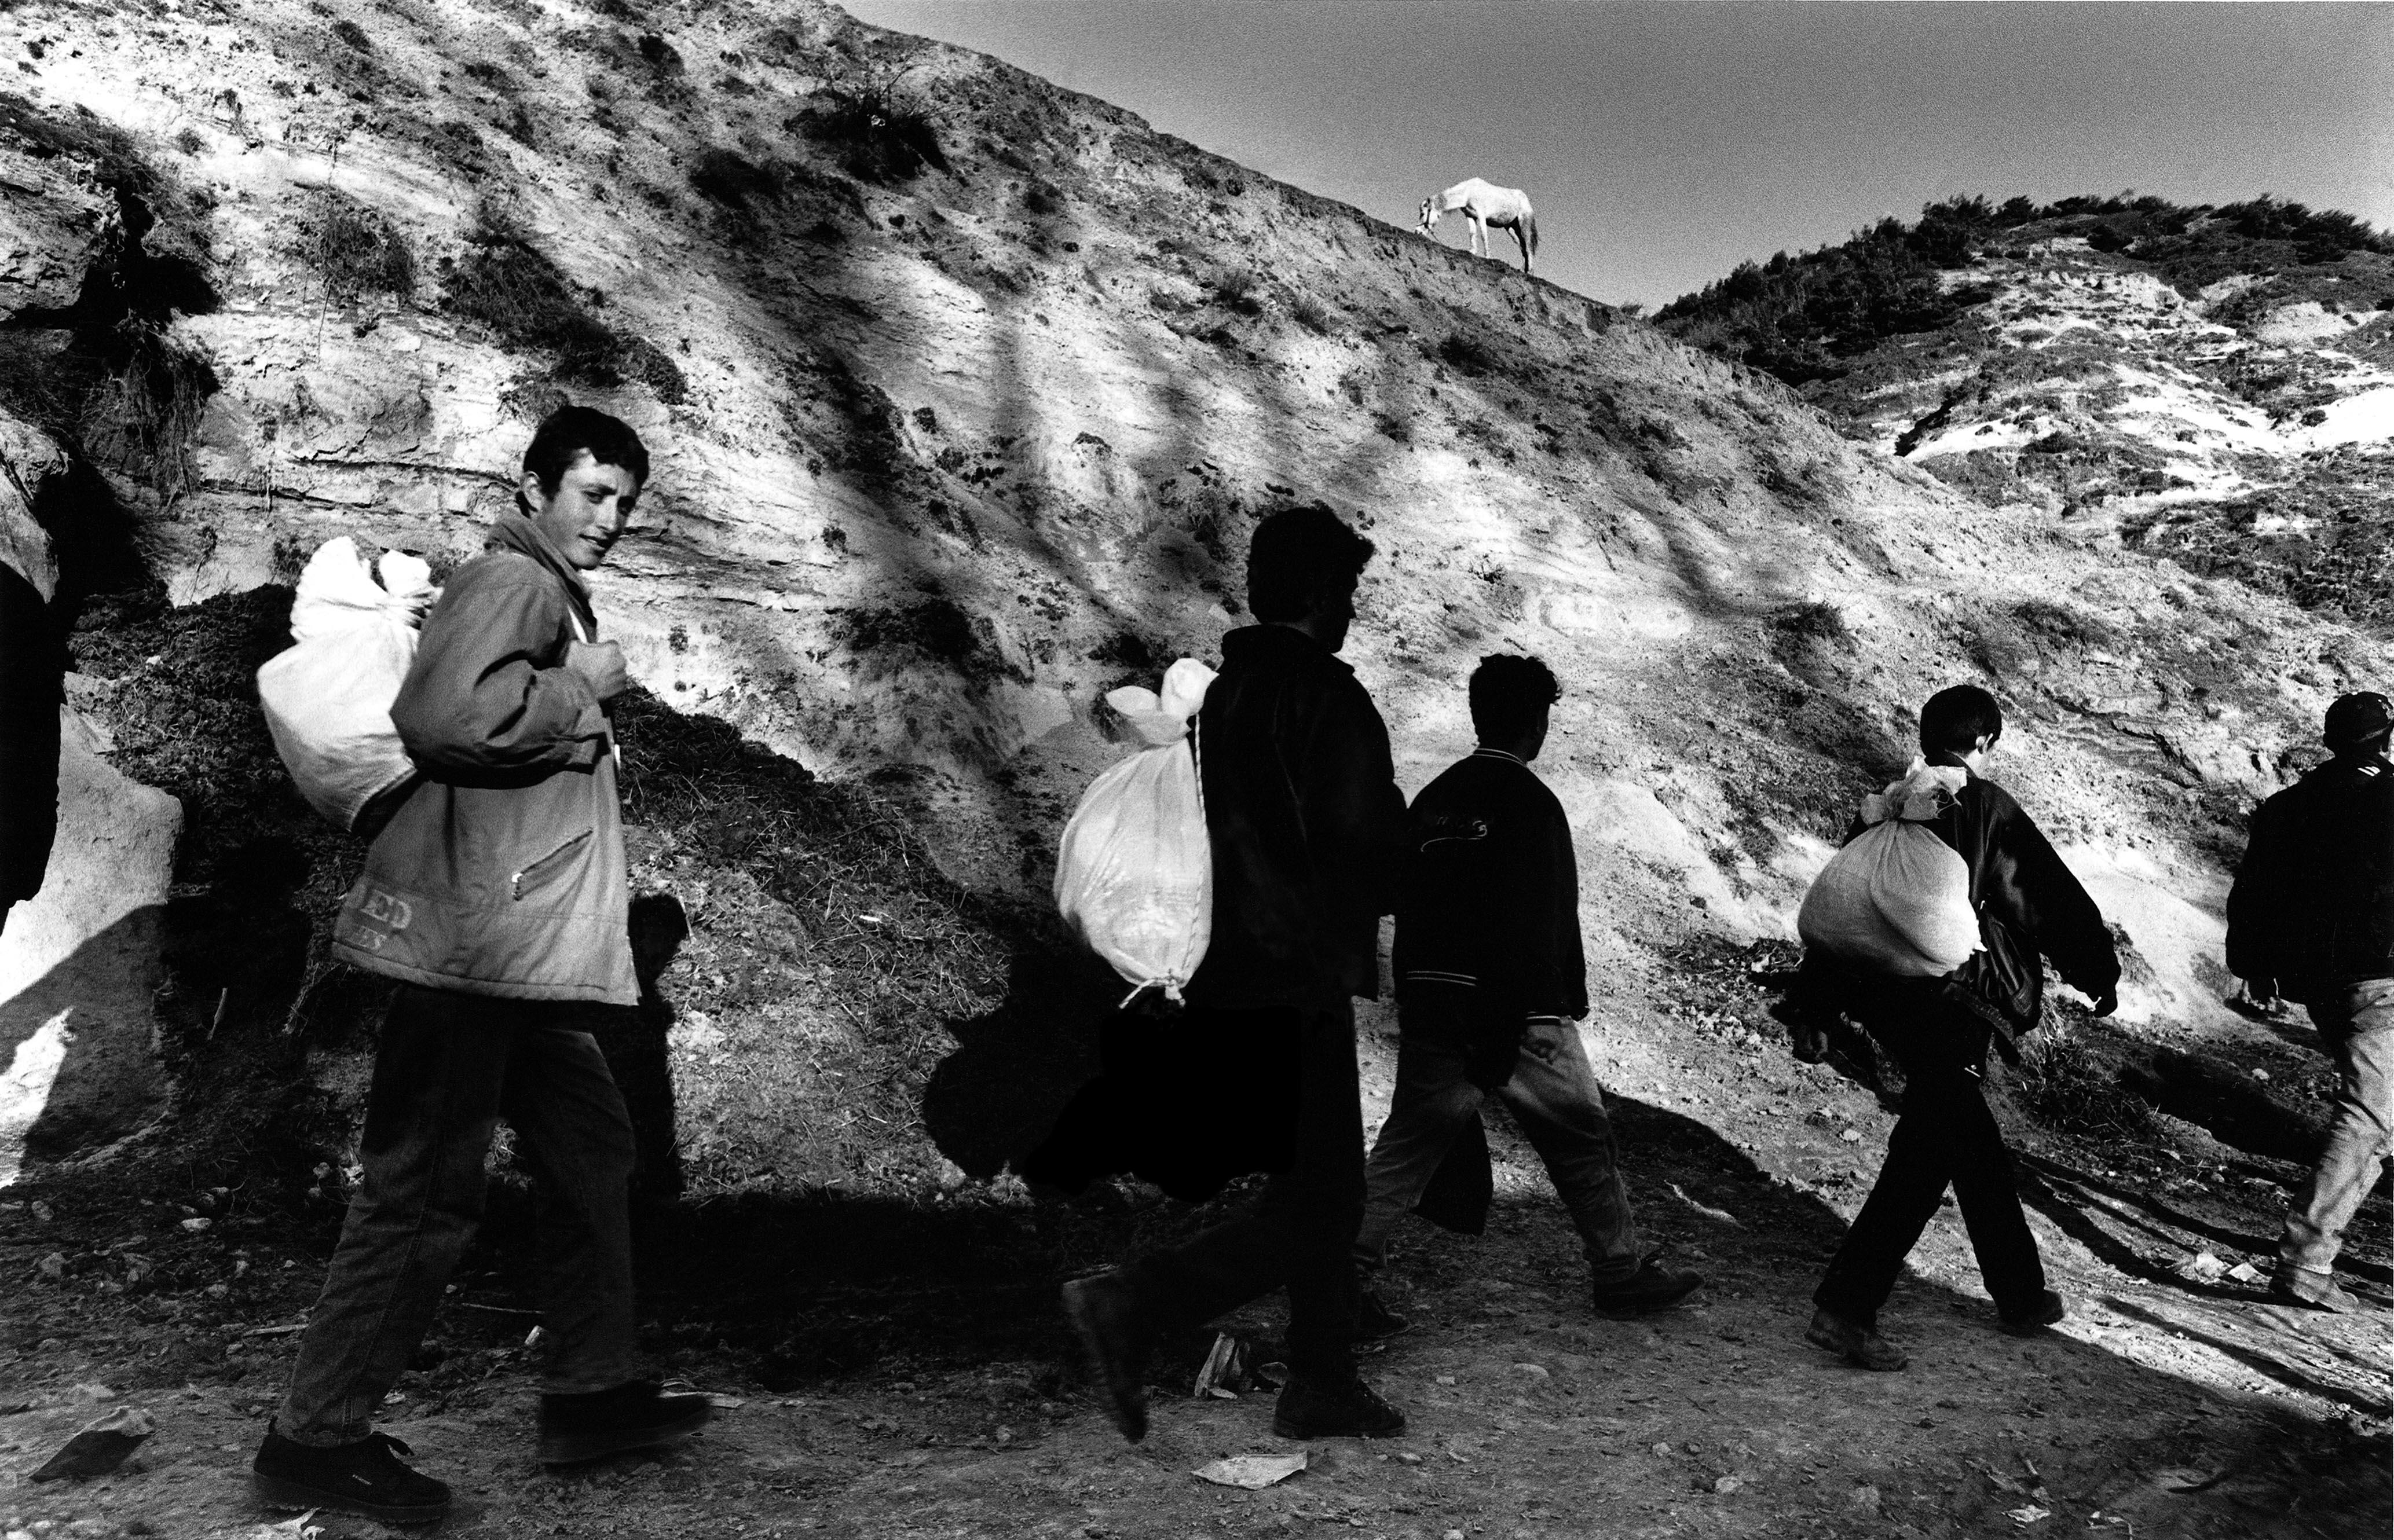 « Go No Go », les frontières de lEurope, 1988-2002 Albanie. © Ad Van Denderen